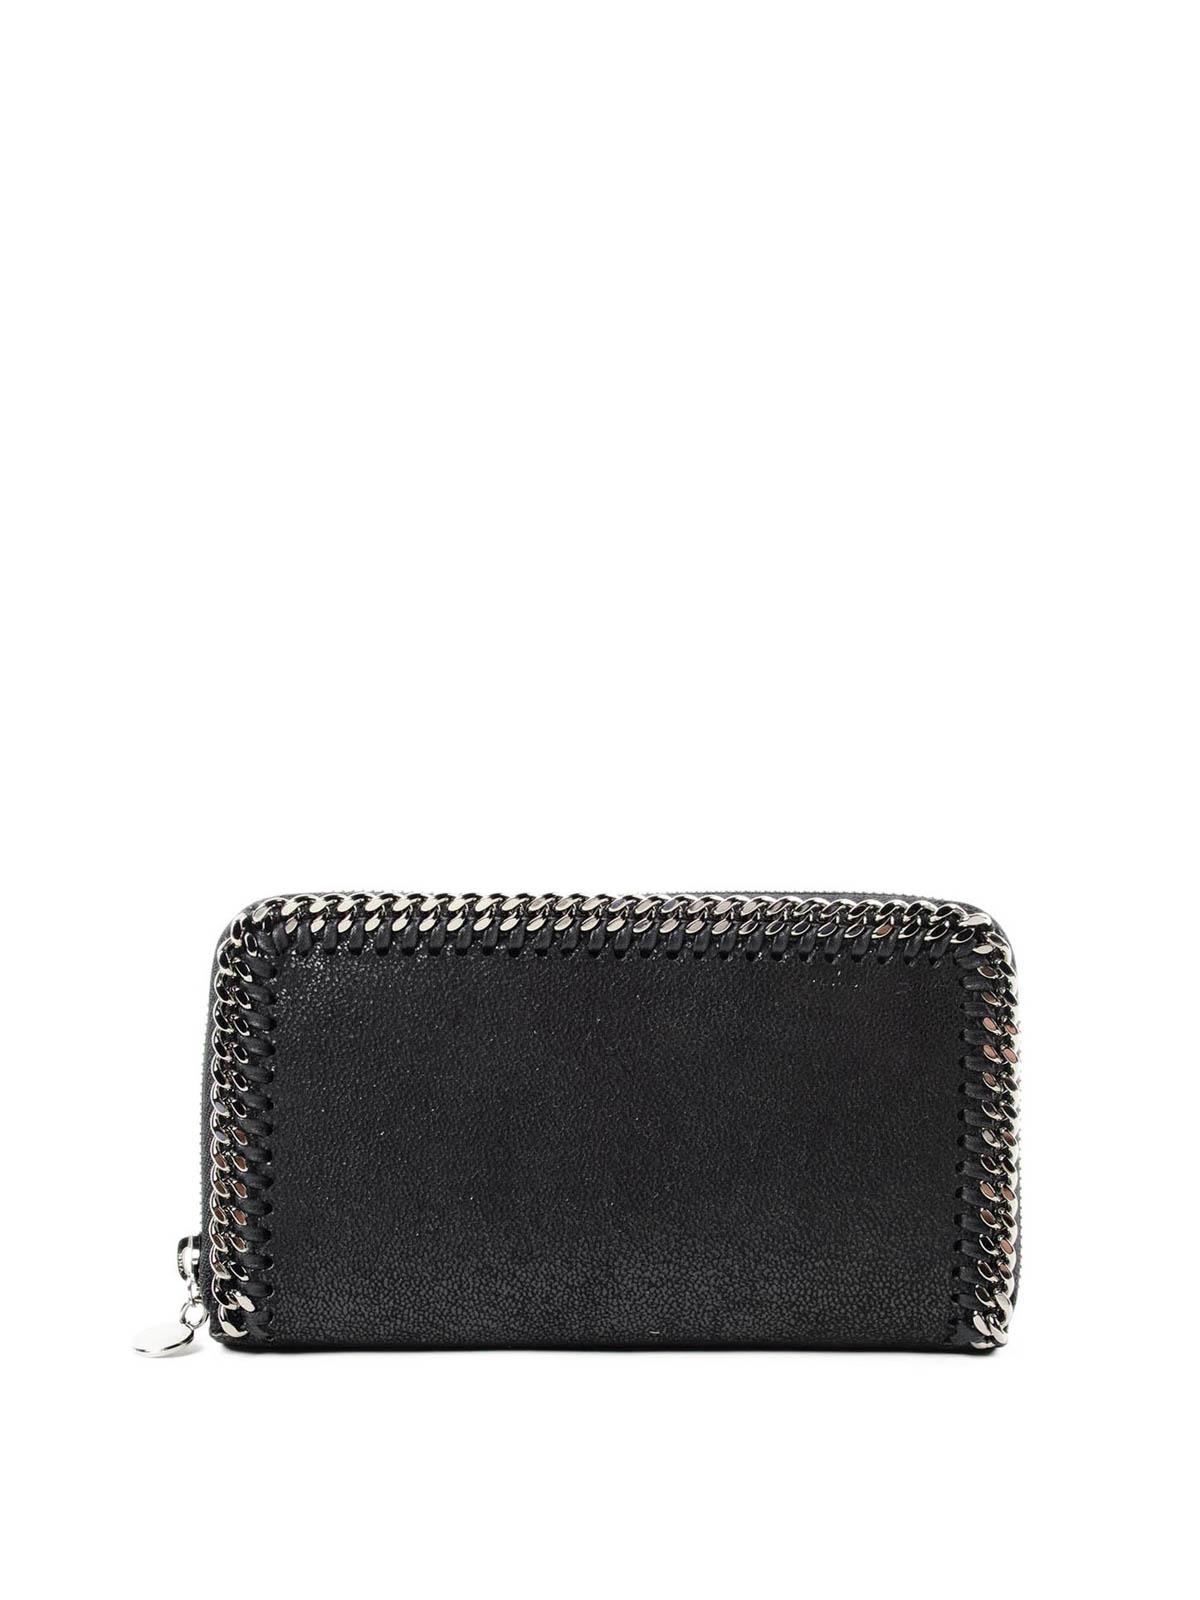 Stella McCartney Falabella zip-around wallet KJzj9cAo